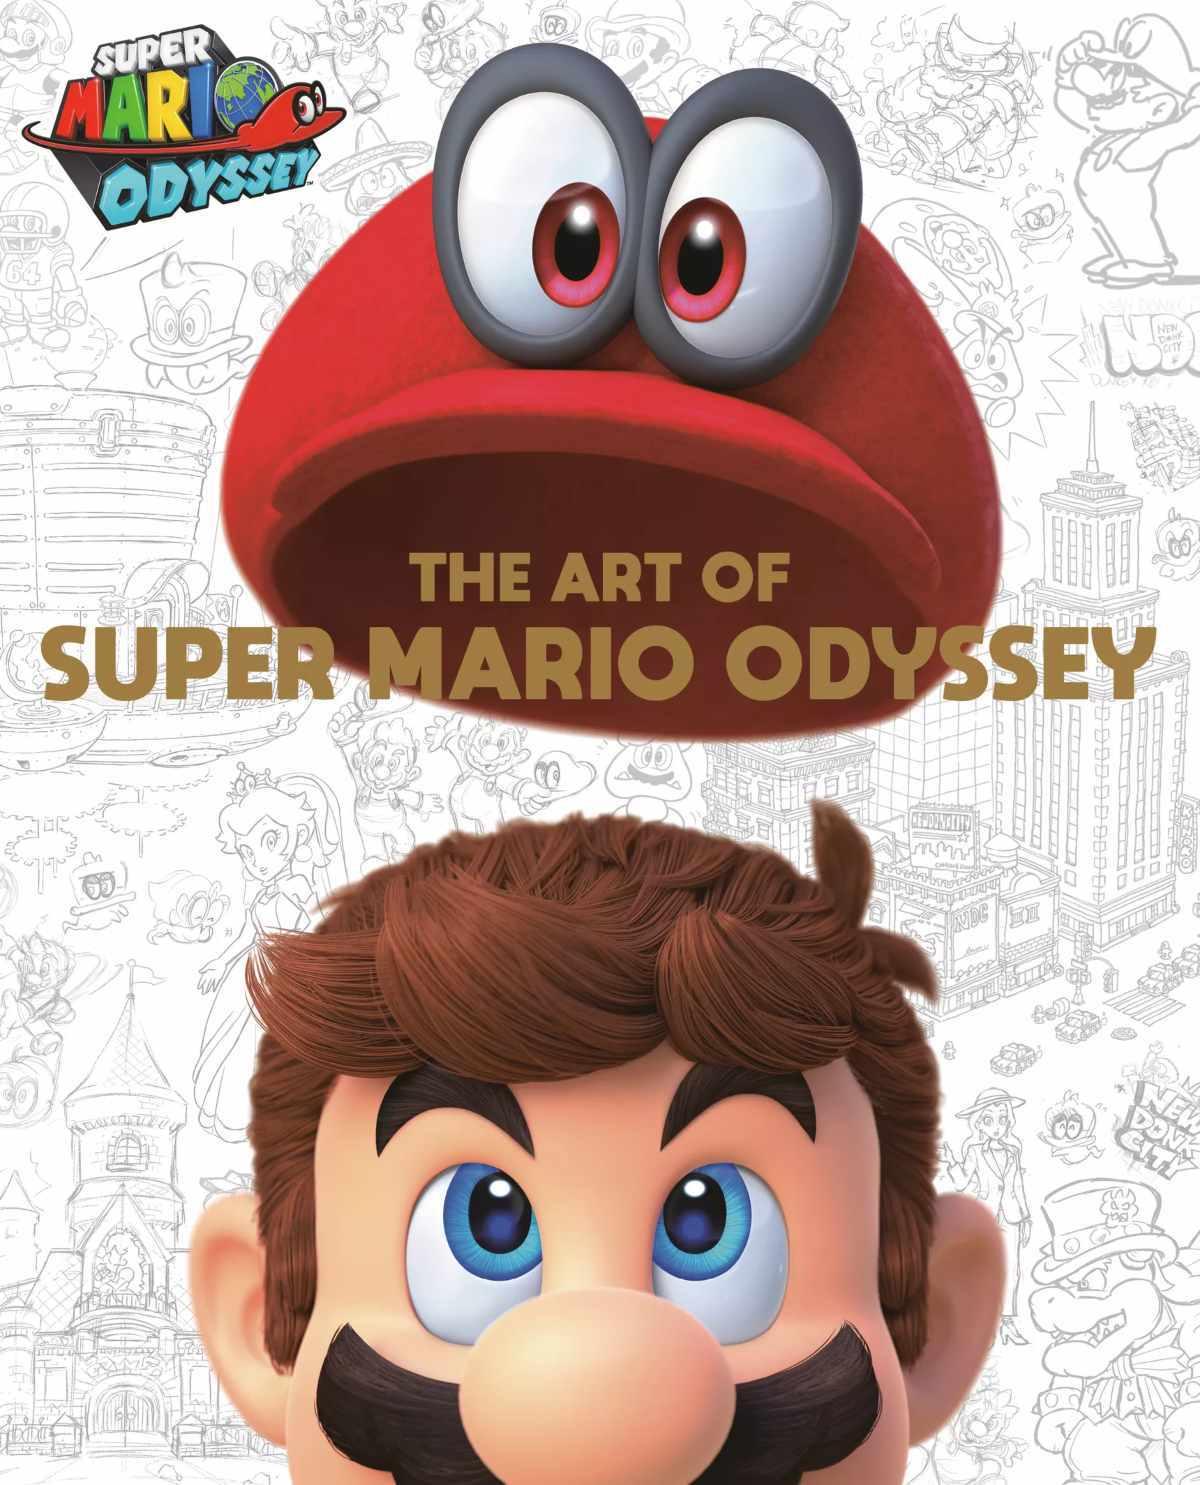 super mario odyssey art book cover